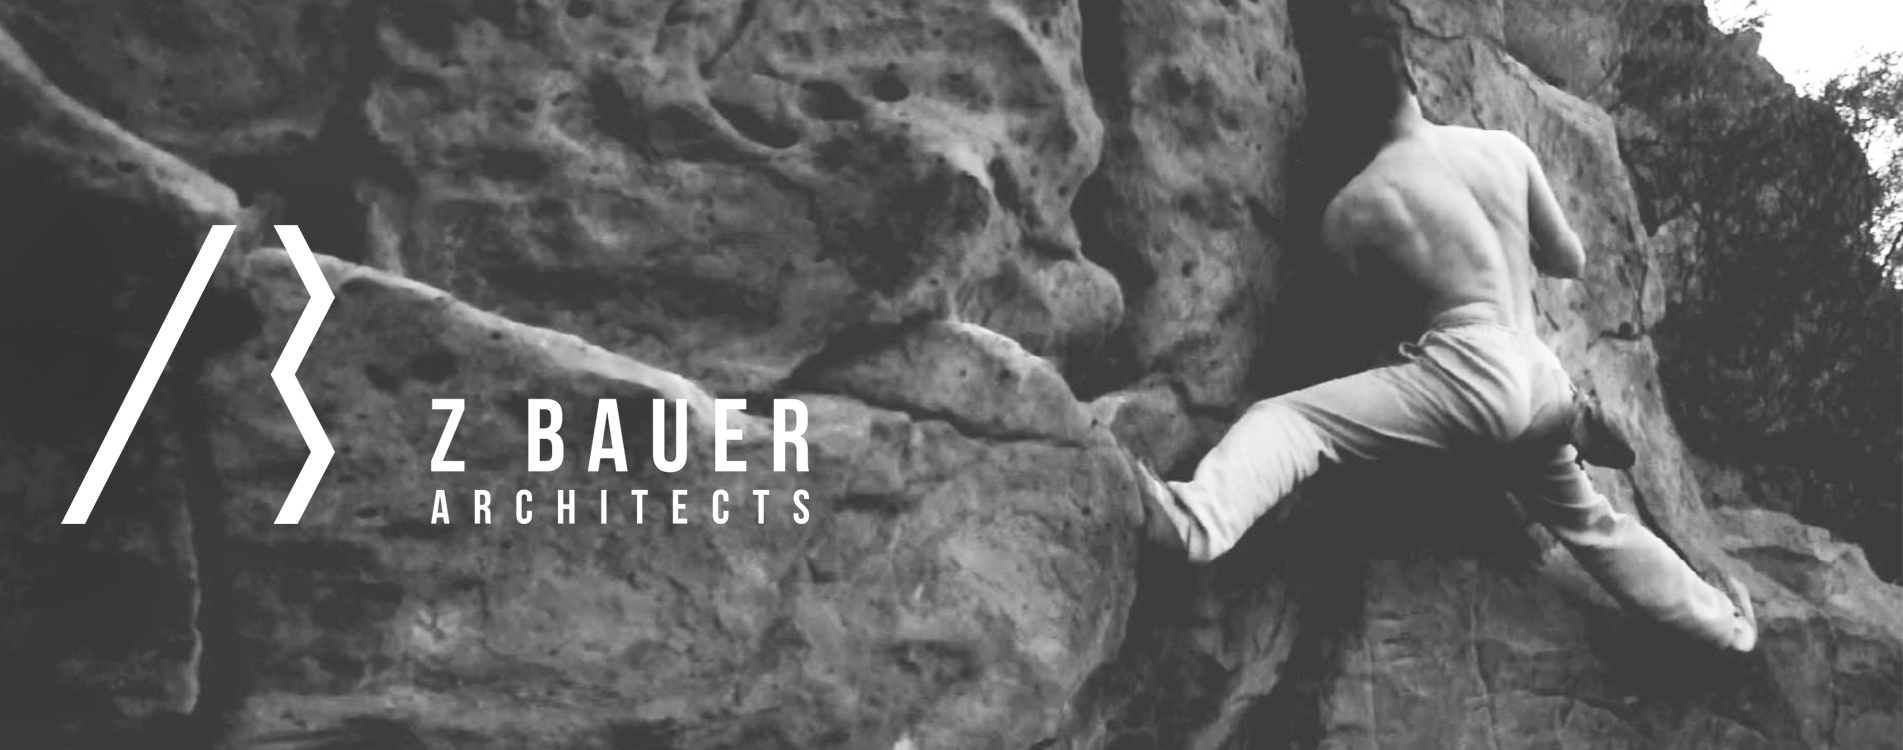 Zohrab Bauer Architect Philosophy Nature 16